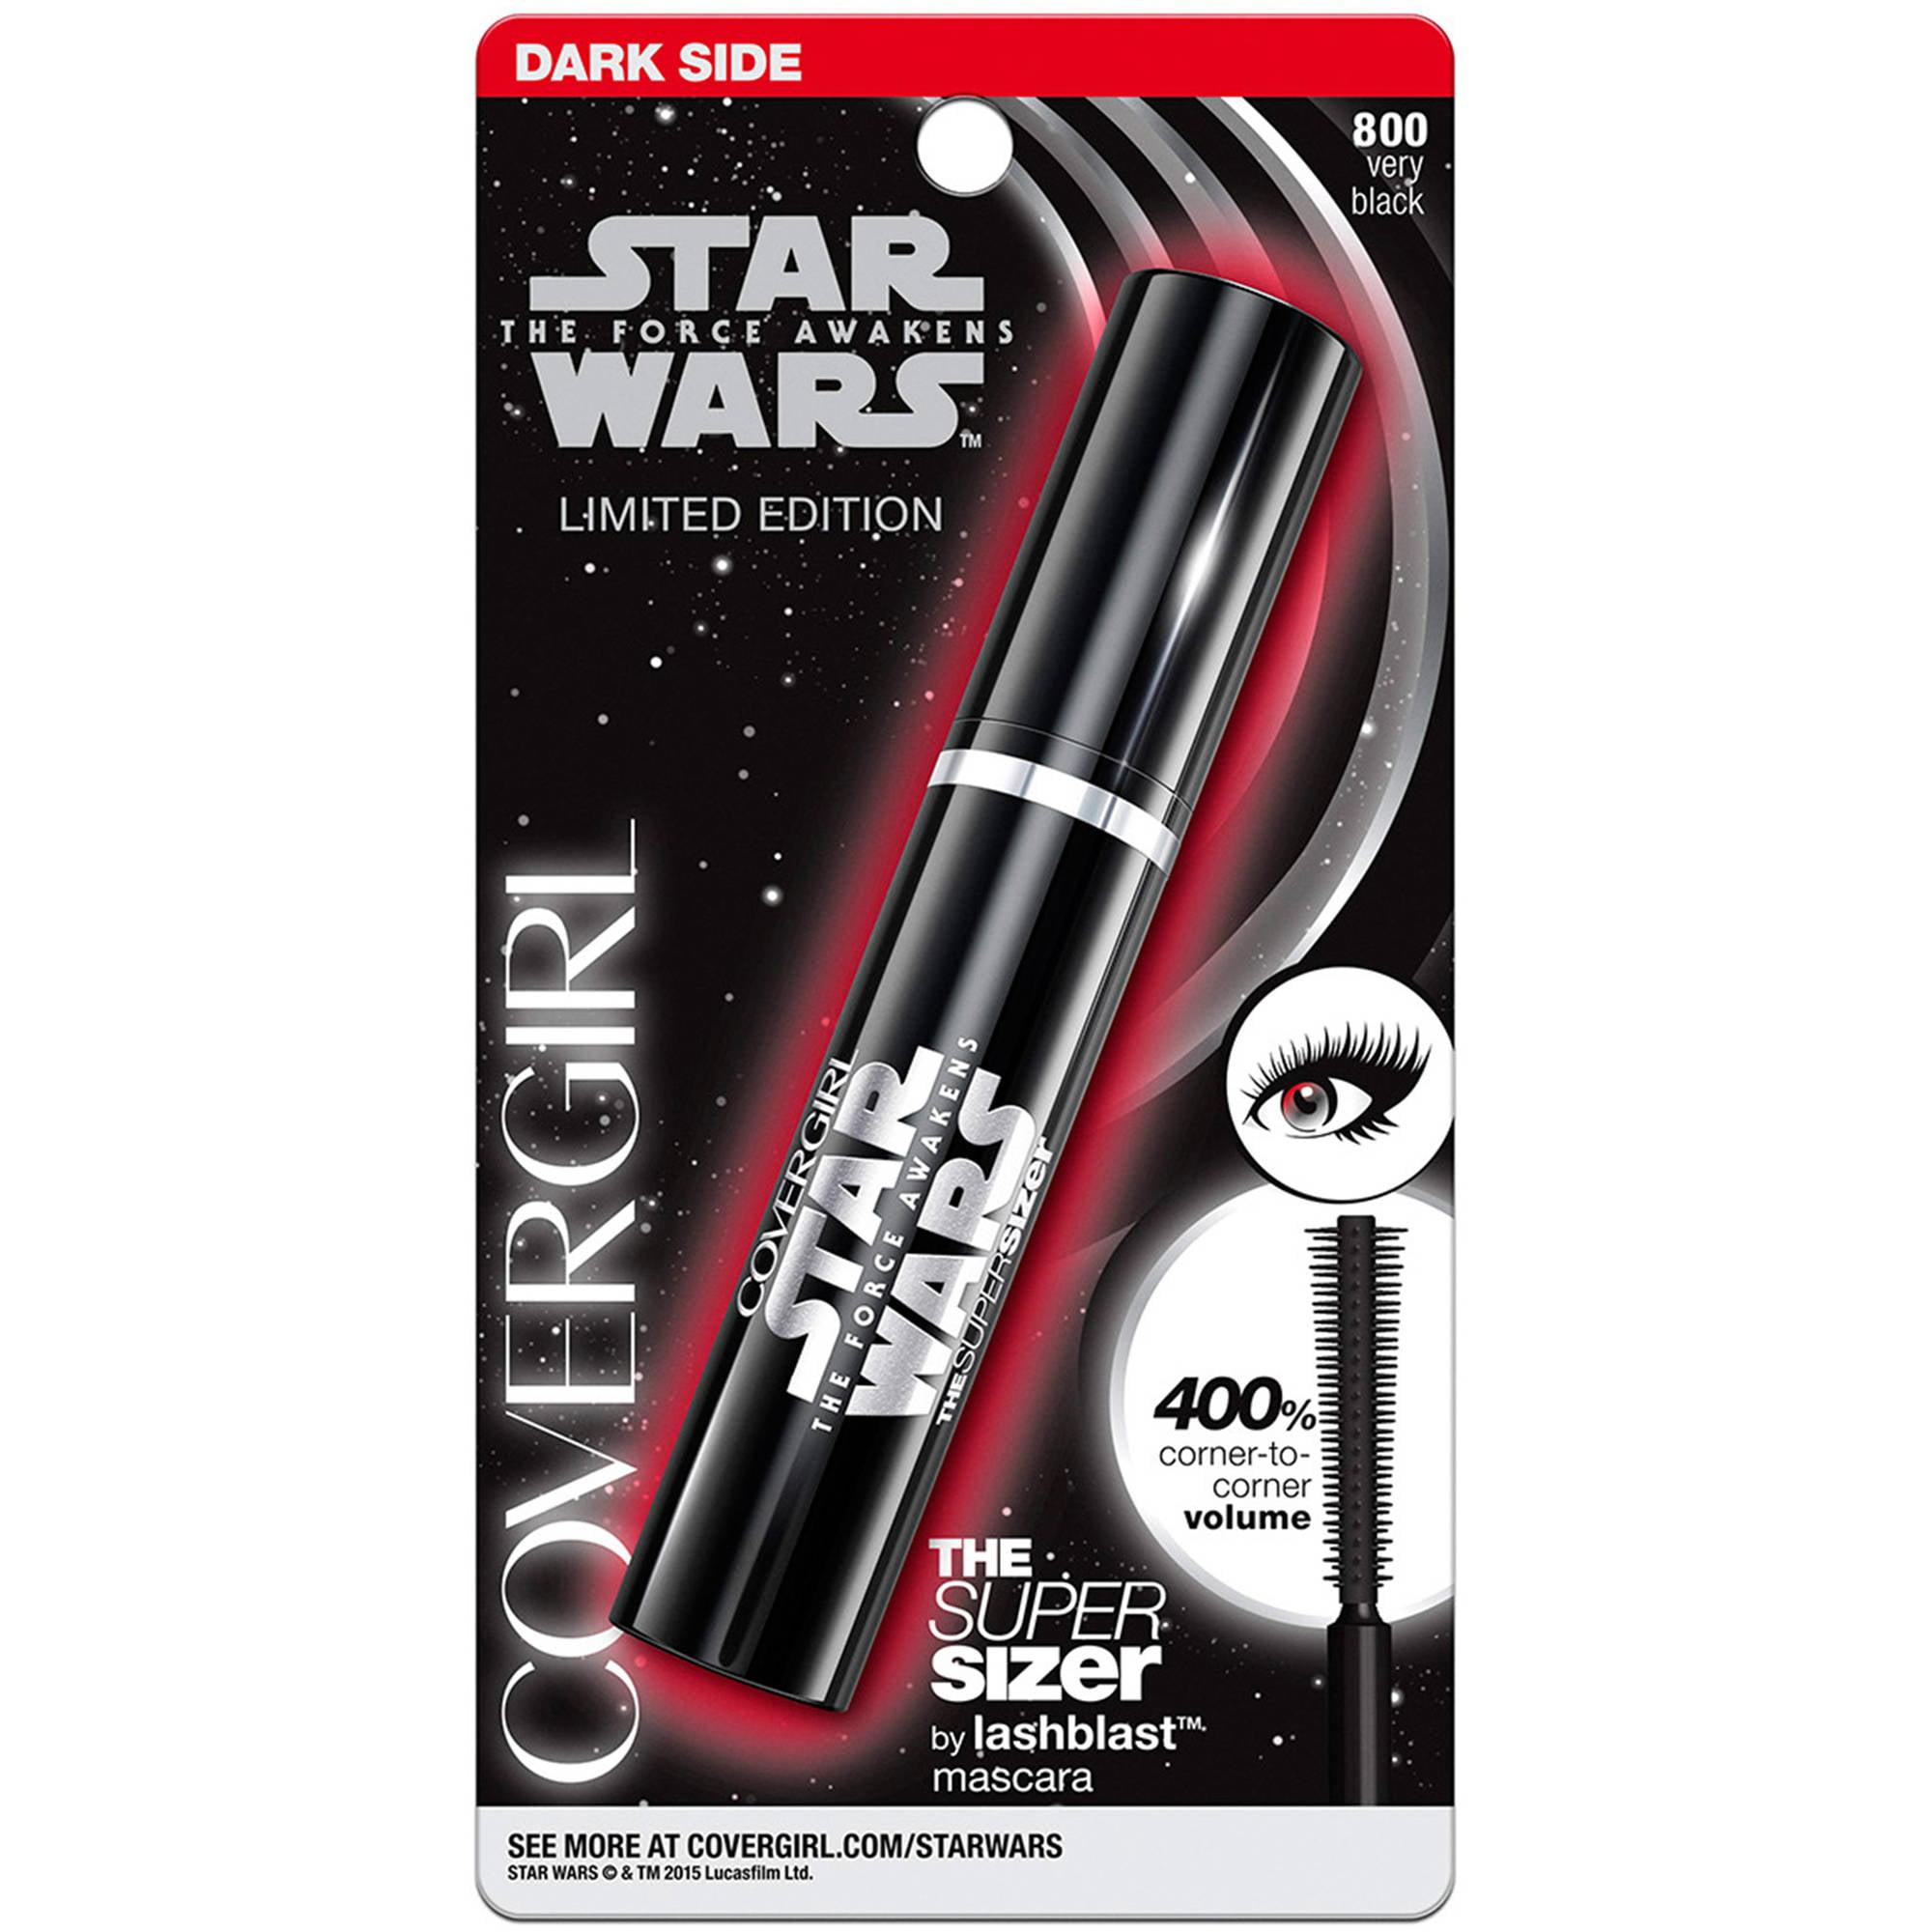 COVERGIRL Star Wars The Super Sizer by lashblast Mascara, 800 Very Black, 0.4 fl oz